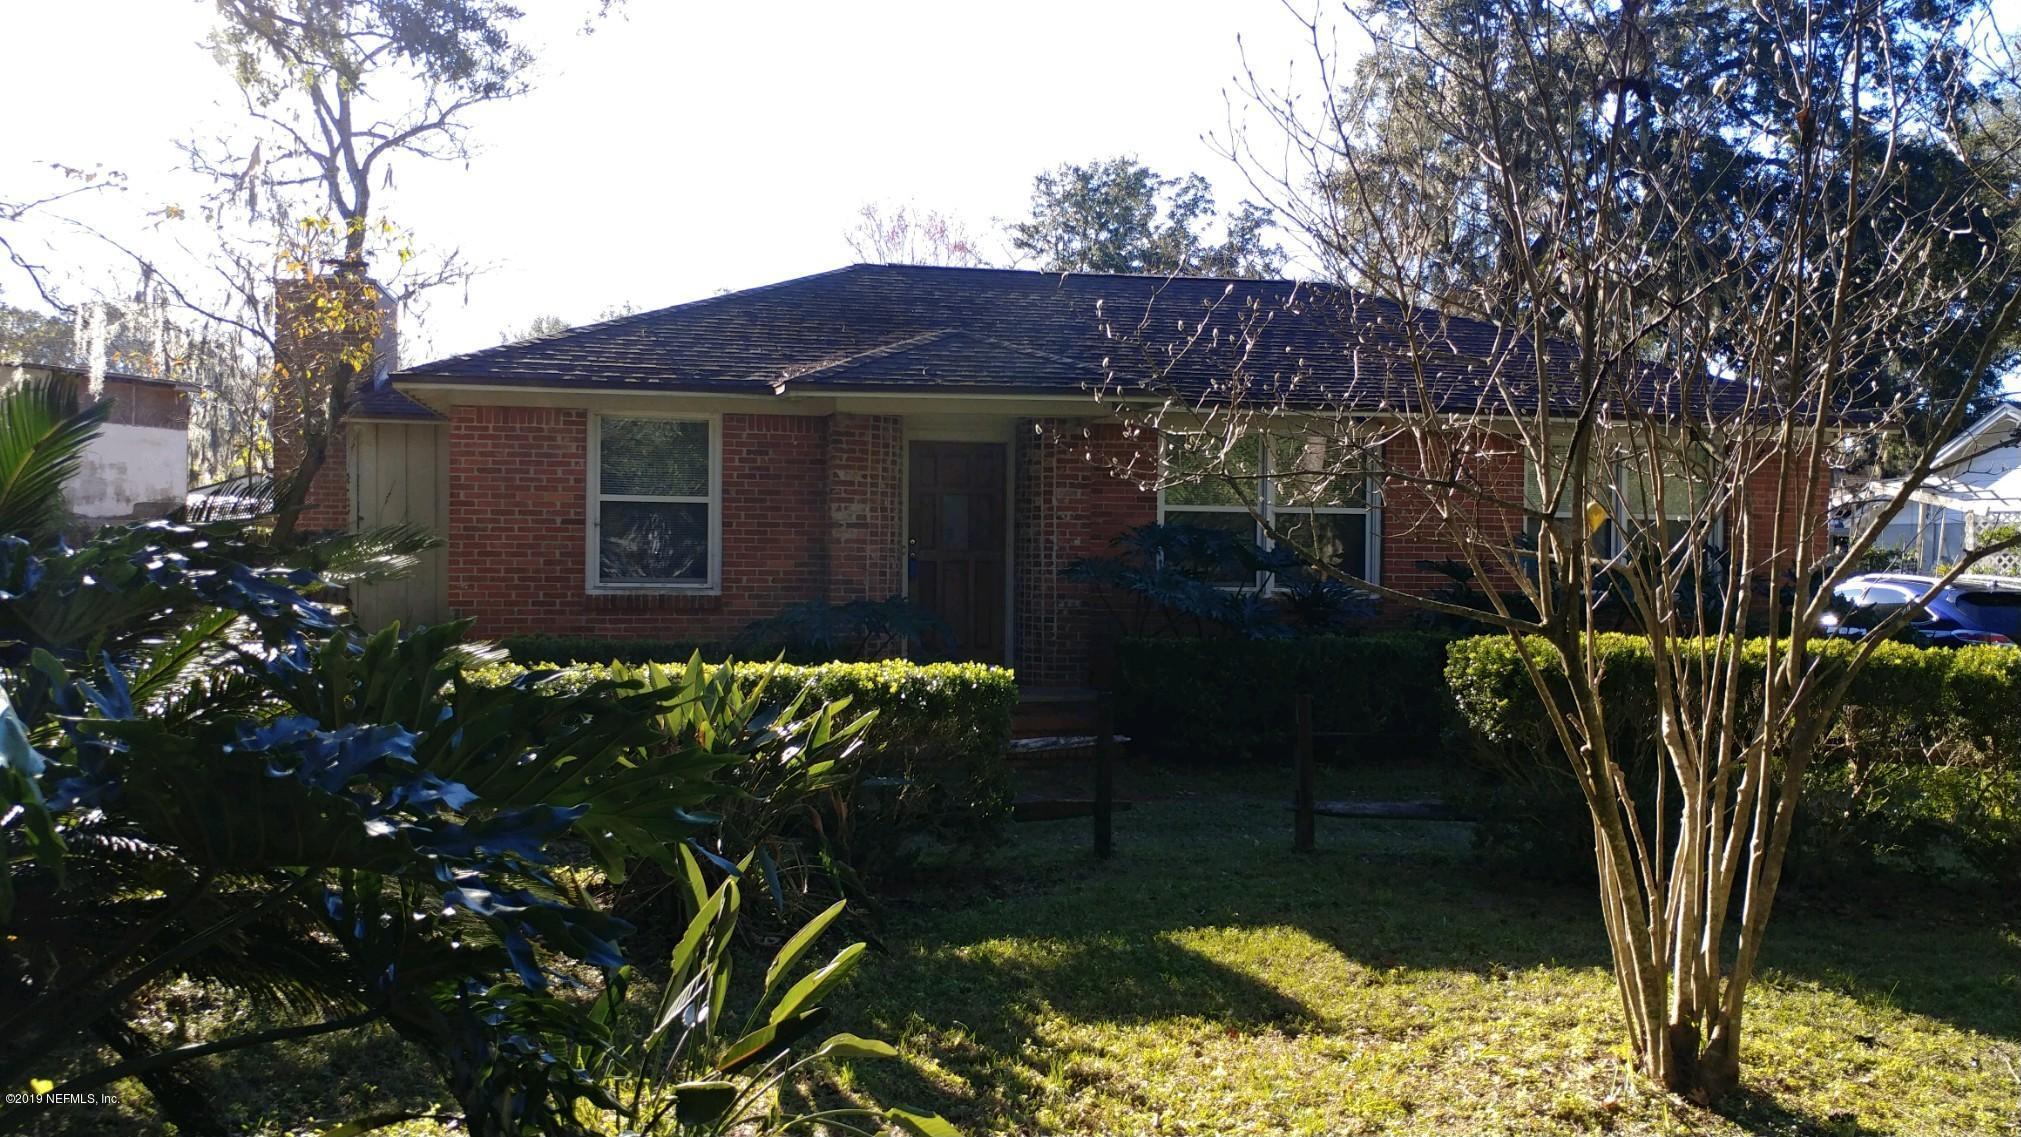 1288 AZALEA, JACKSONVILLE, FLORIDA 32205, 3 Bedrooms Bedrooms, ,1 BathroomBathrooms,Residential - single family,For sale,AZALEA,974167